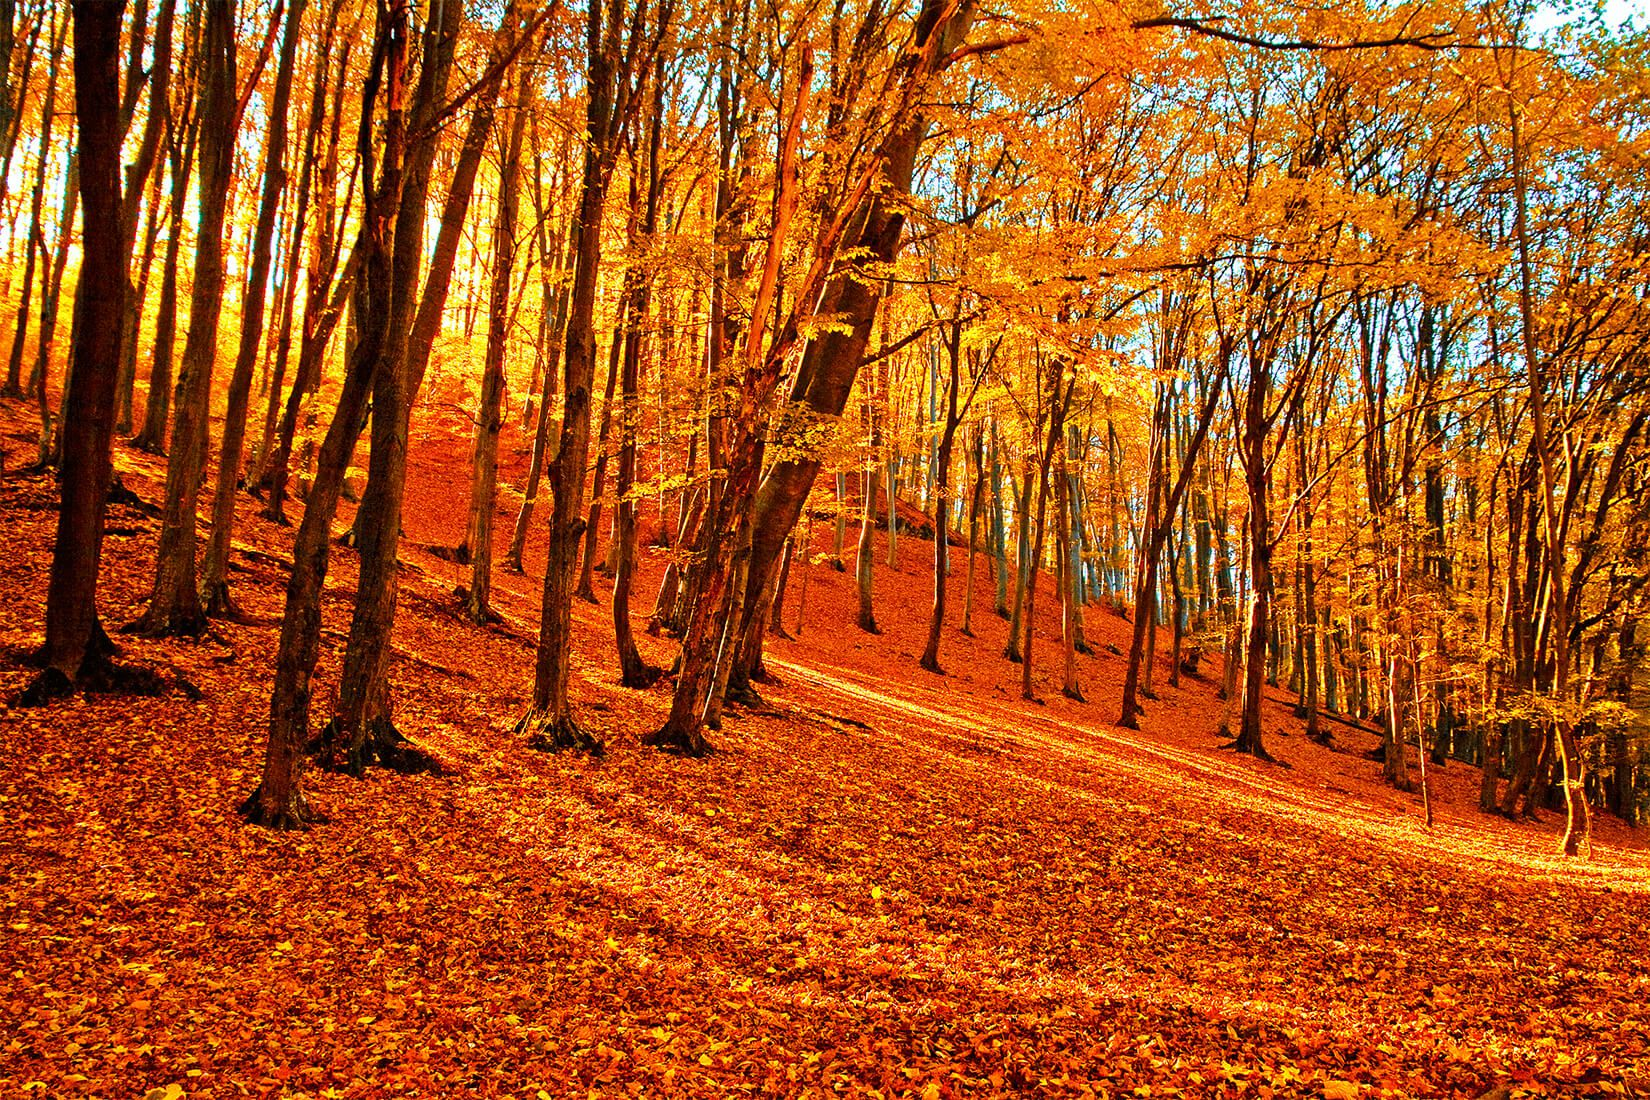 Autumn Forest Wallpaper Mural Autumn forest, Forest